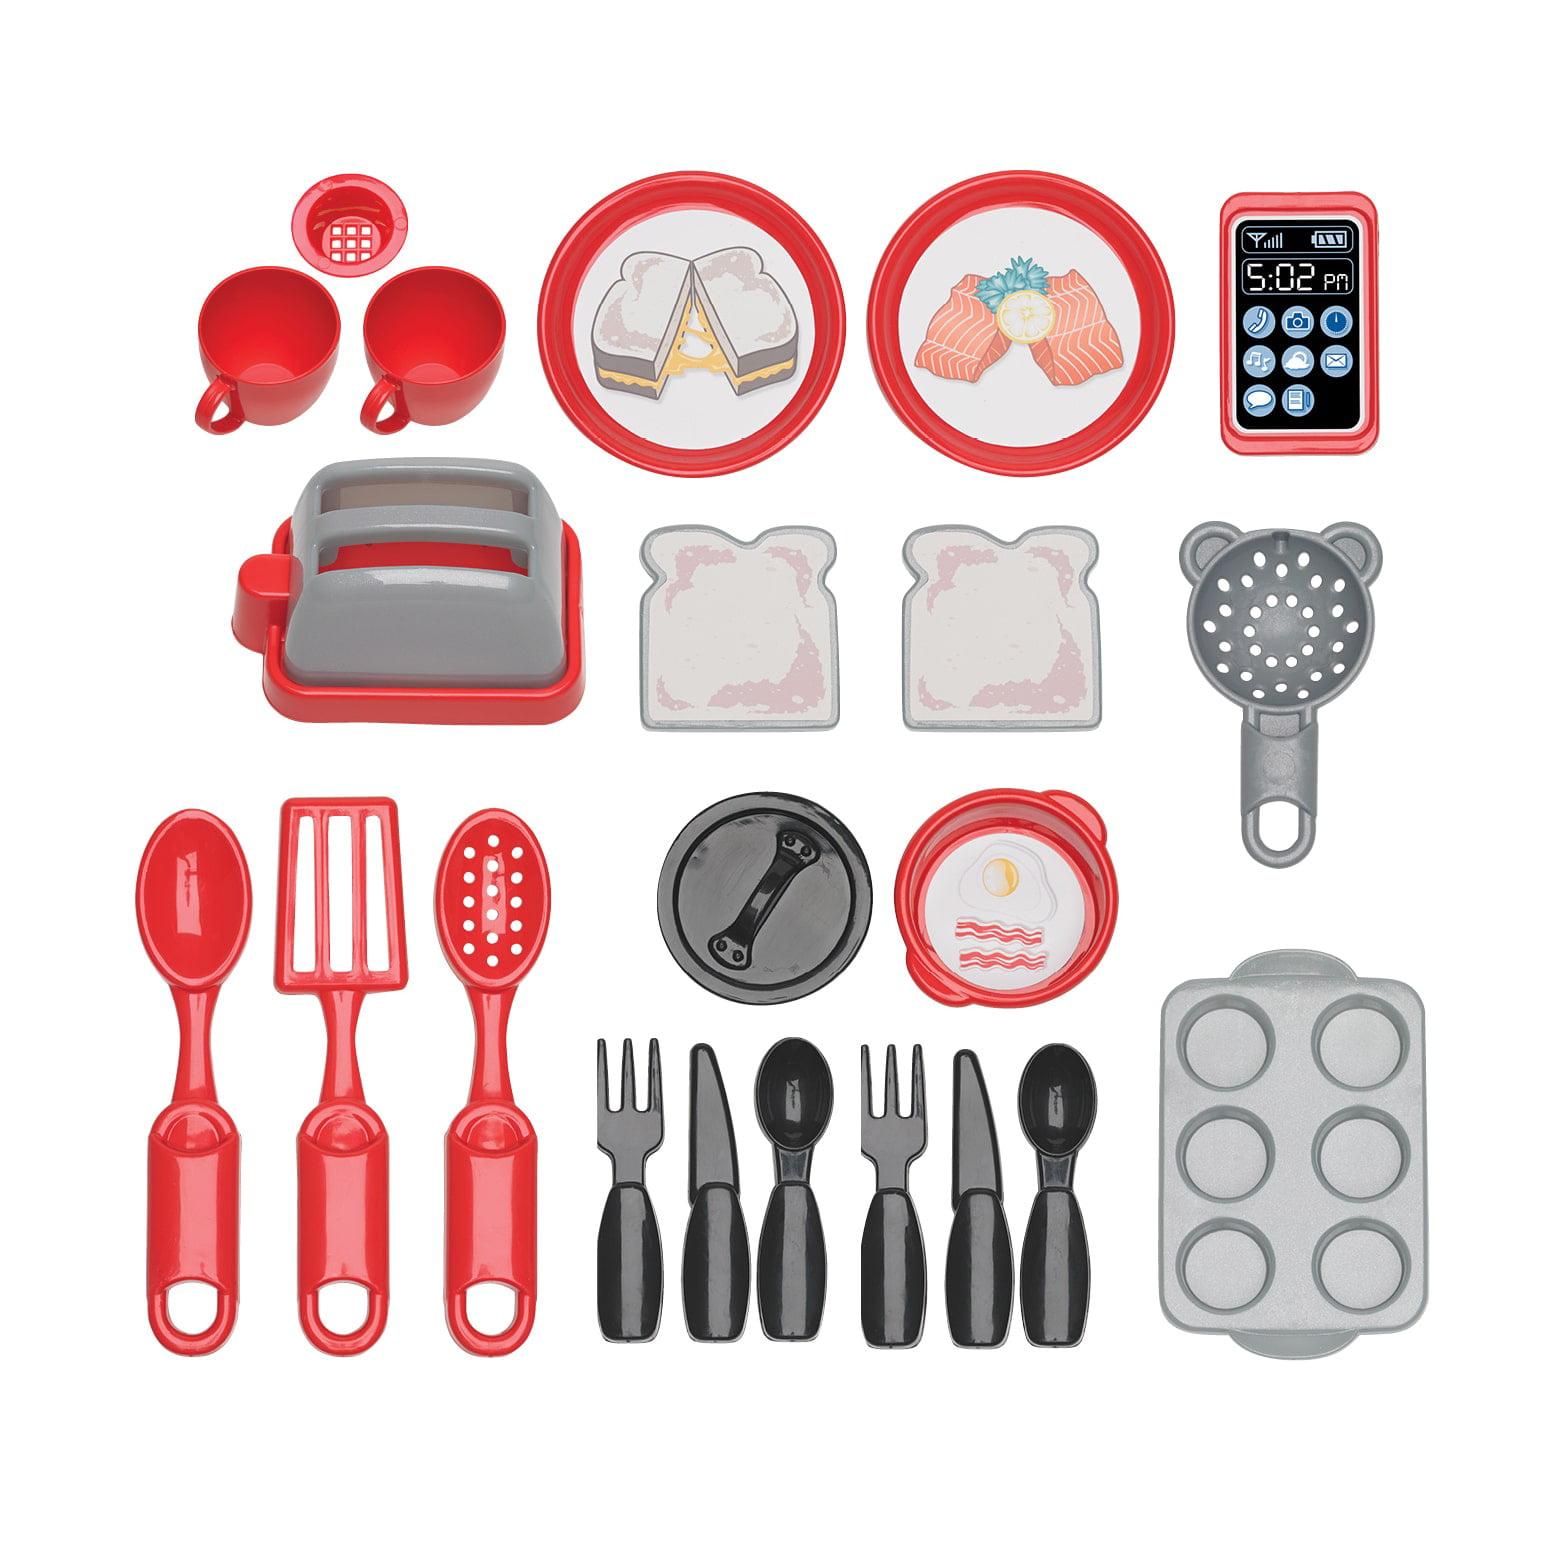 American Plastic Toys Cozy Comfort Kitchen ft. 22 Accessories ...